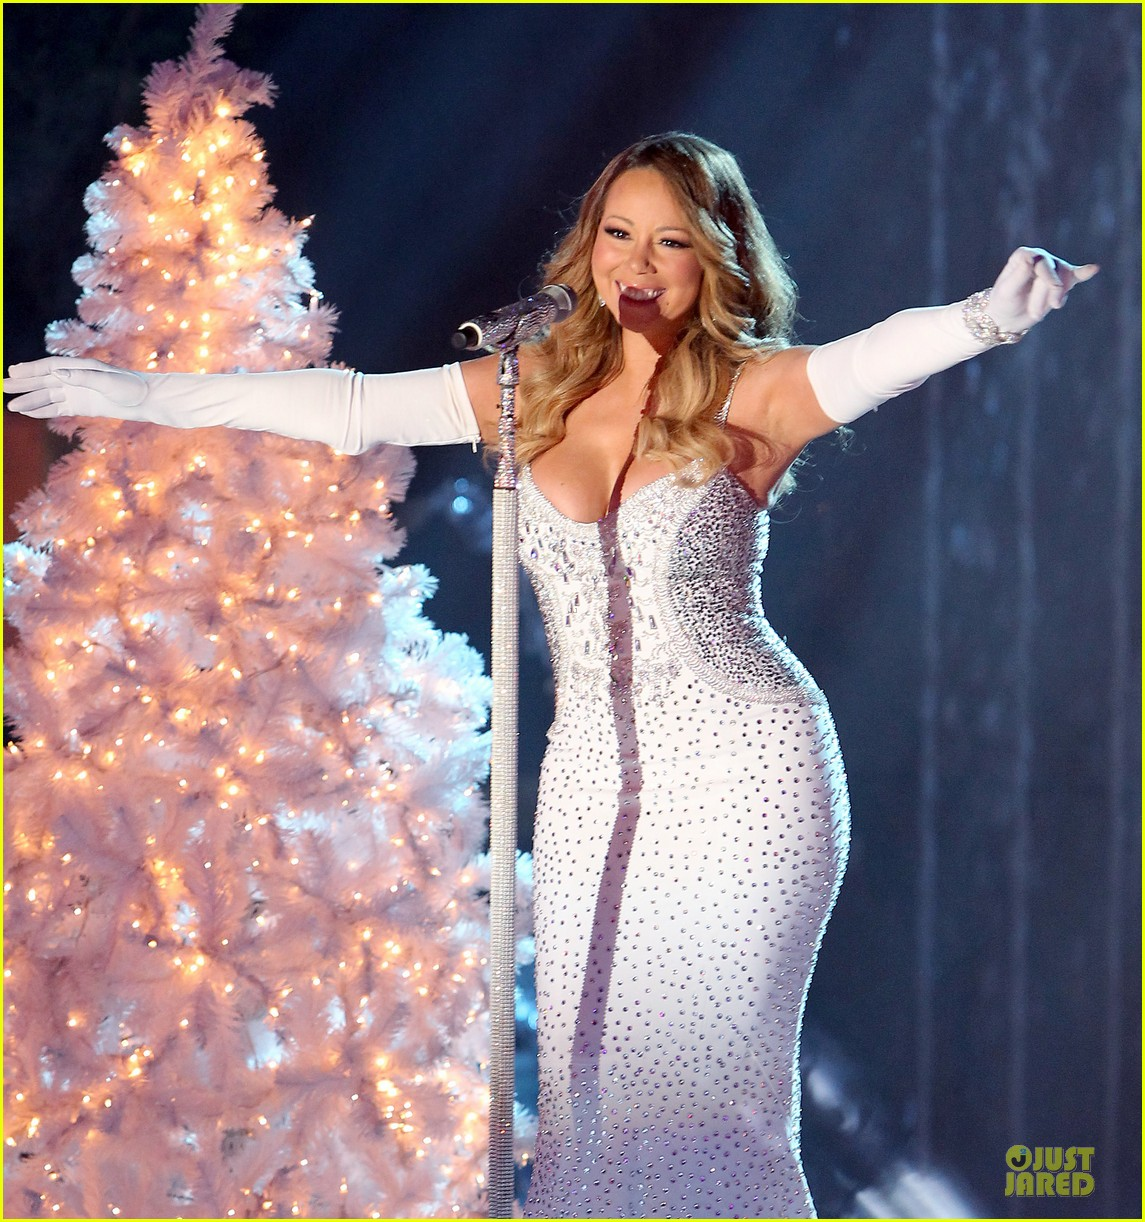 mariah carey rockfeller center christmas tree lighting 2013 performer 20